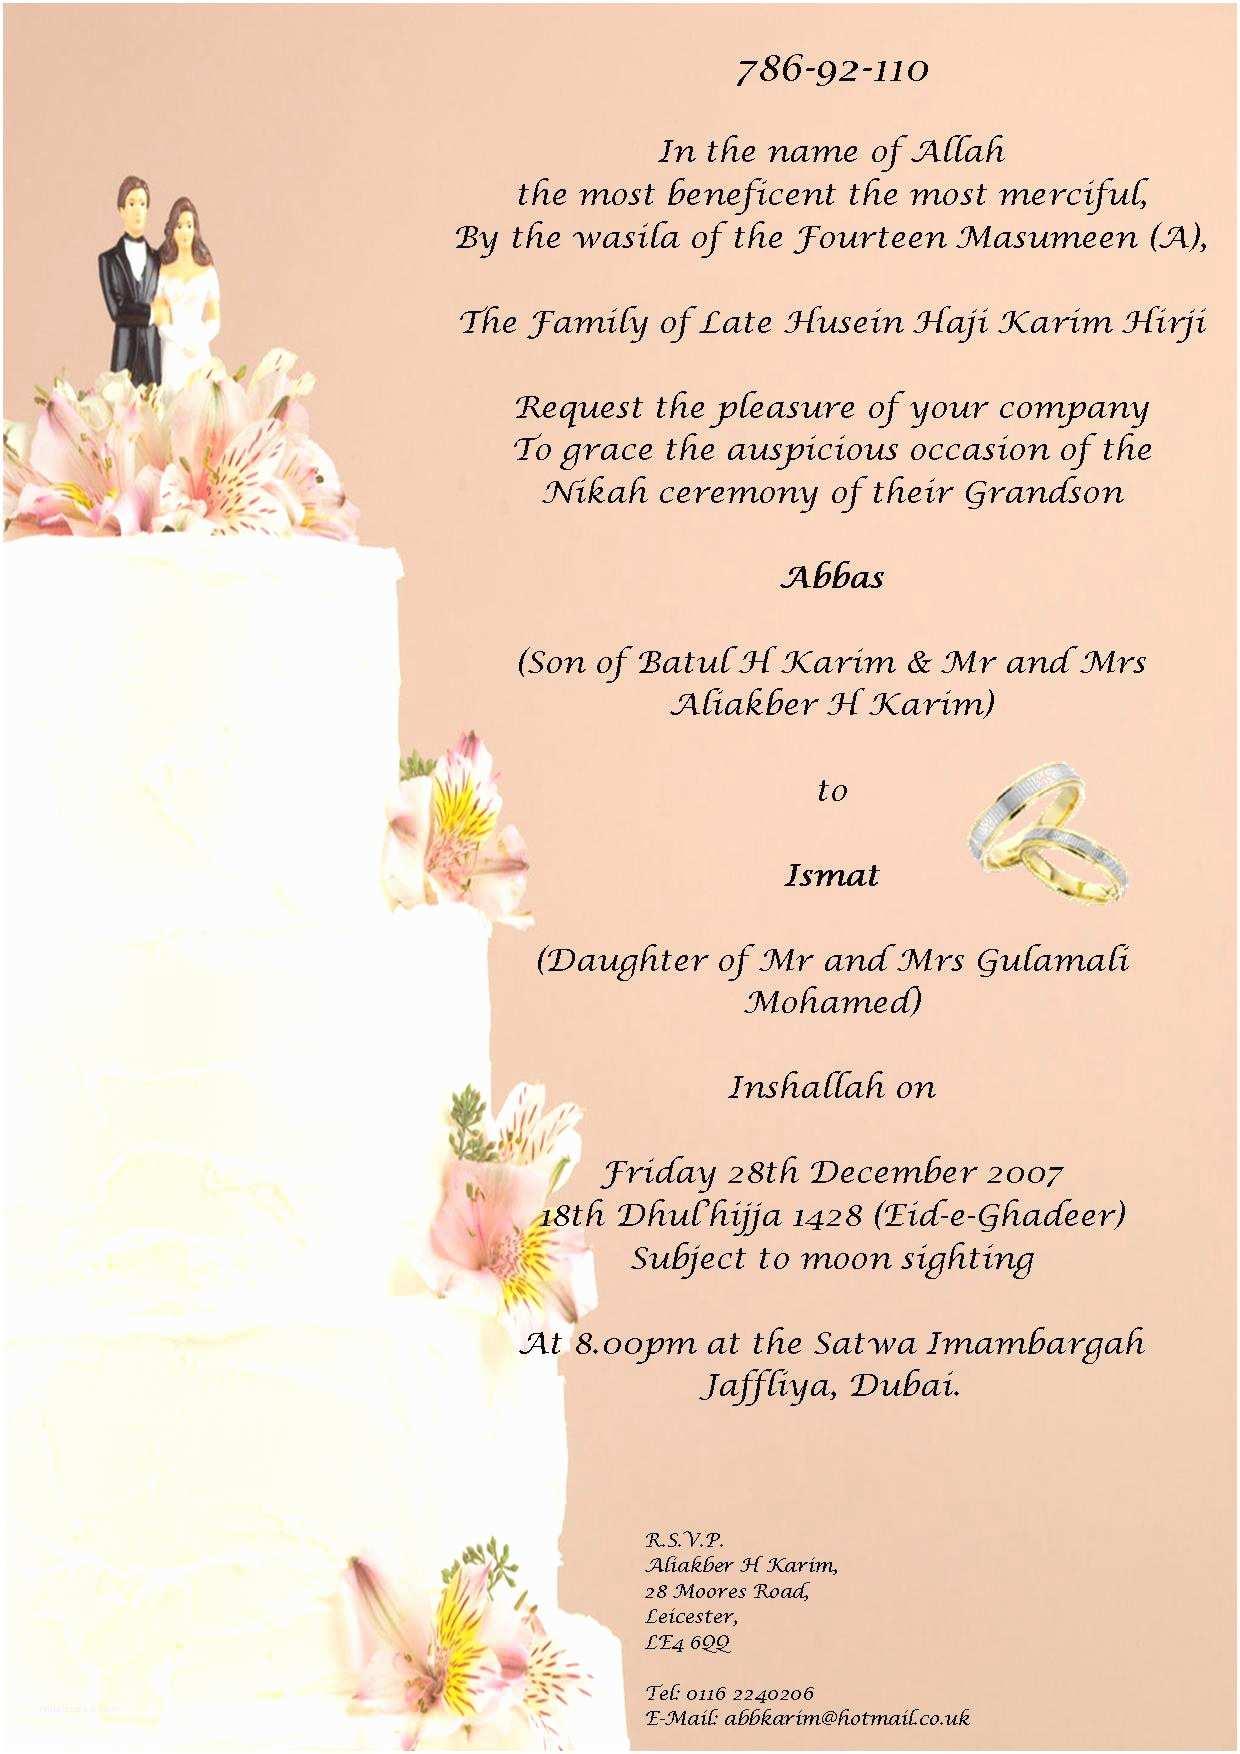 Wedding Card Invitation Wedding Invitation Wording Wedding Invitation Card